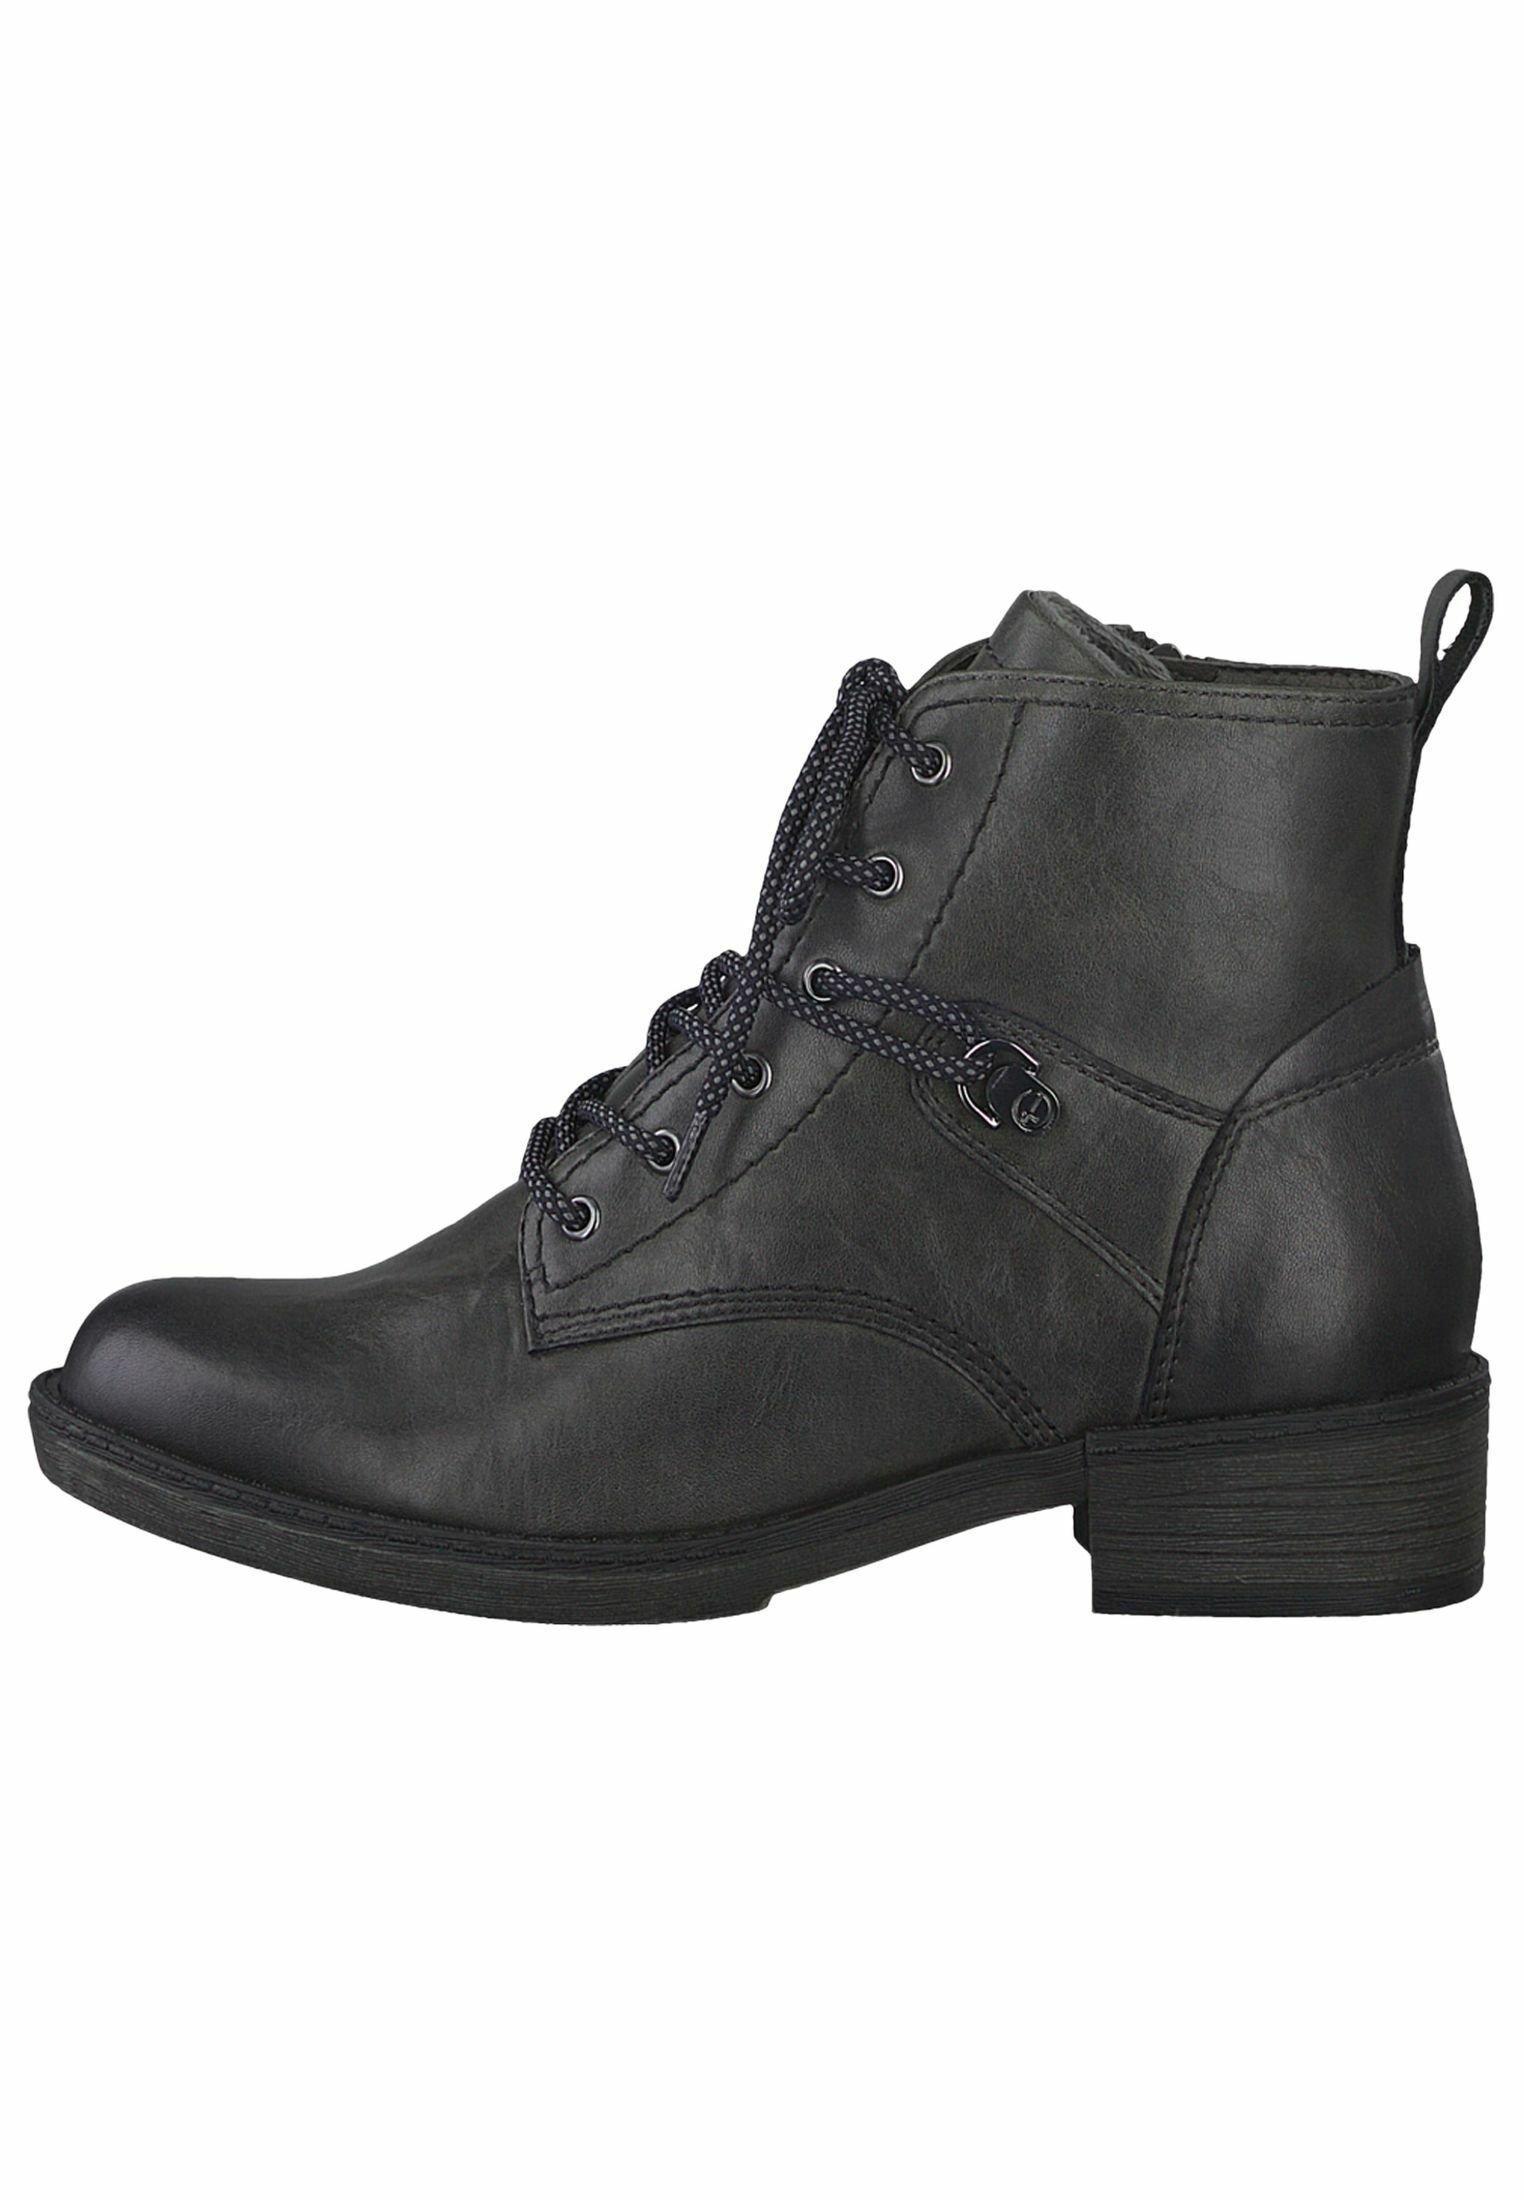 Tamaris Ankle Boot - Vine/rot